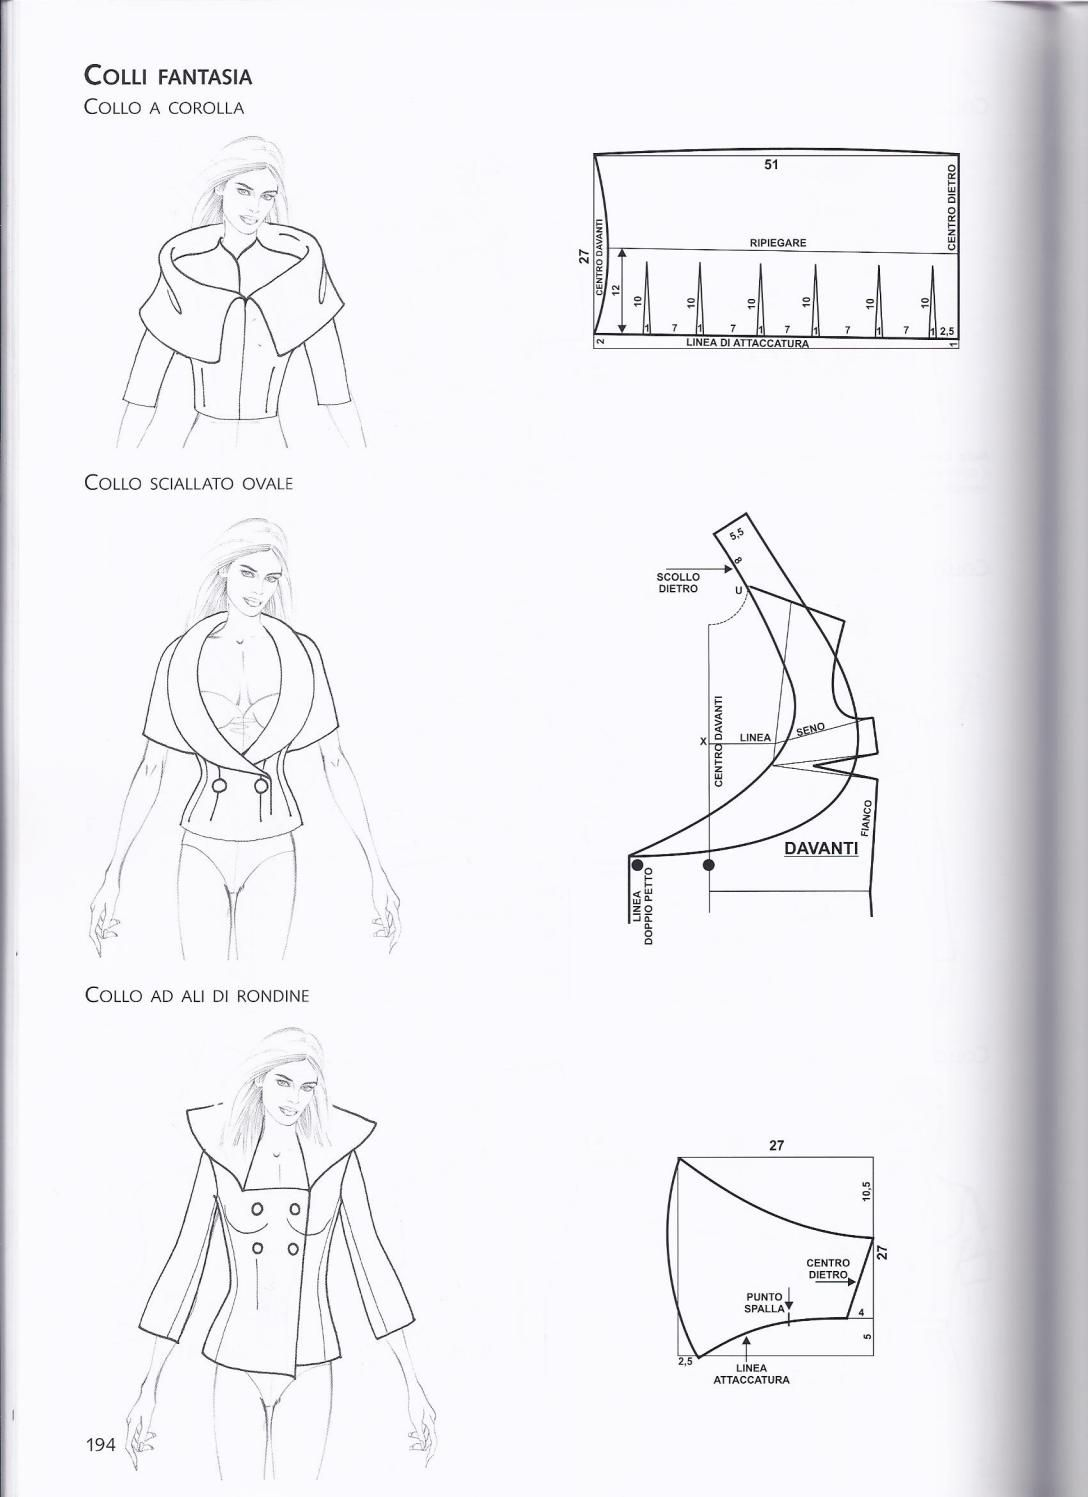 La tecnica dei modelli uomo donna 1 | Patrones, Molde y Costura